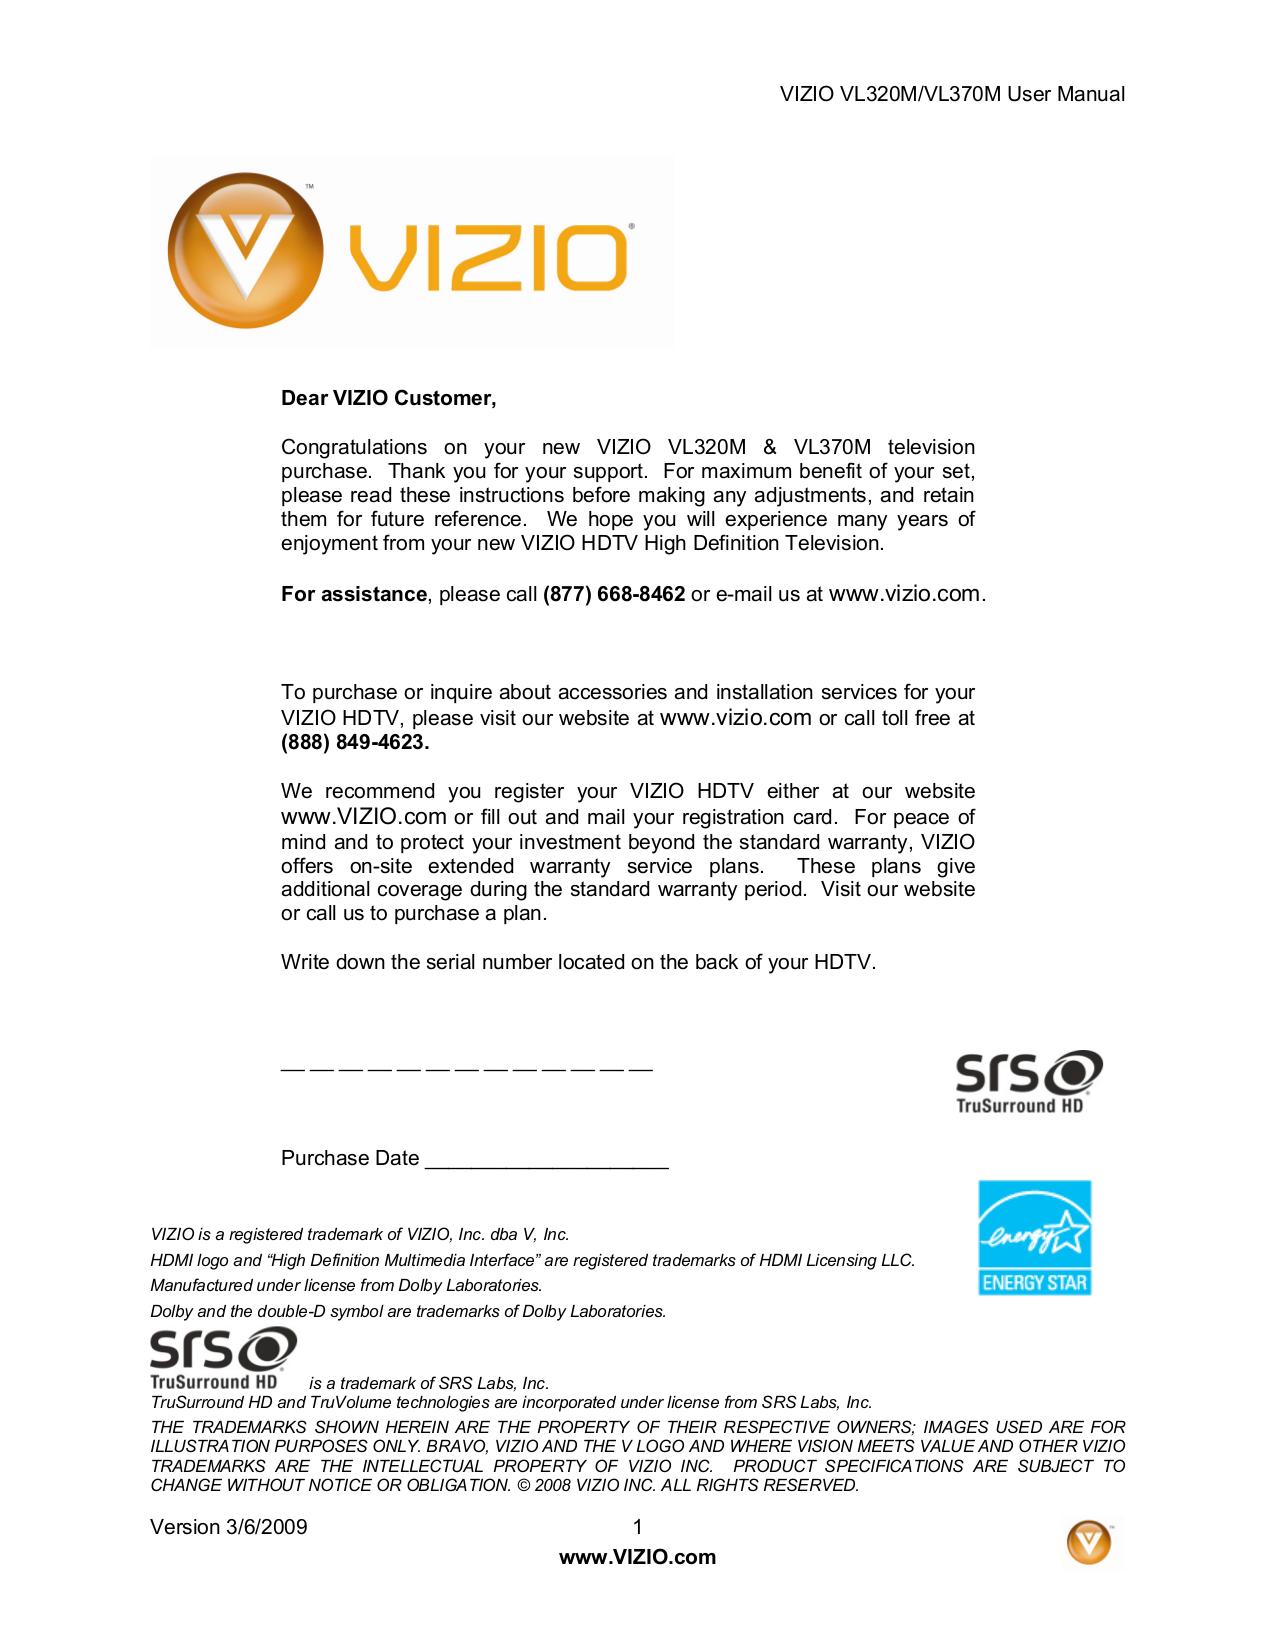 ... Array - download free pdf for vizio vl320m tv manual rh umlib com